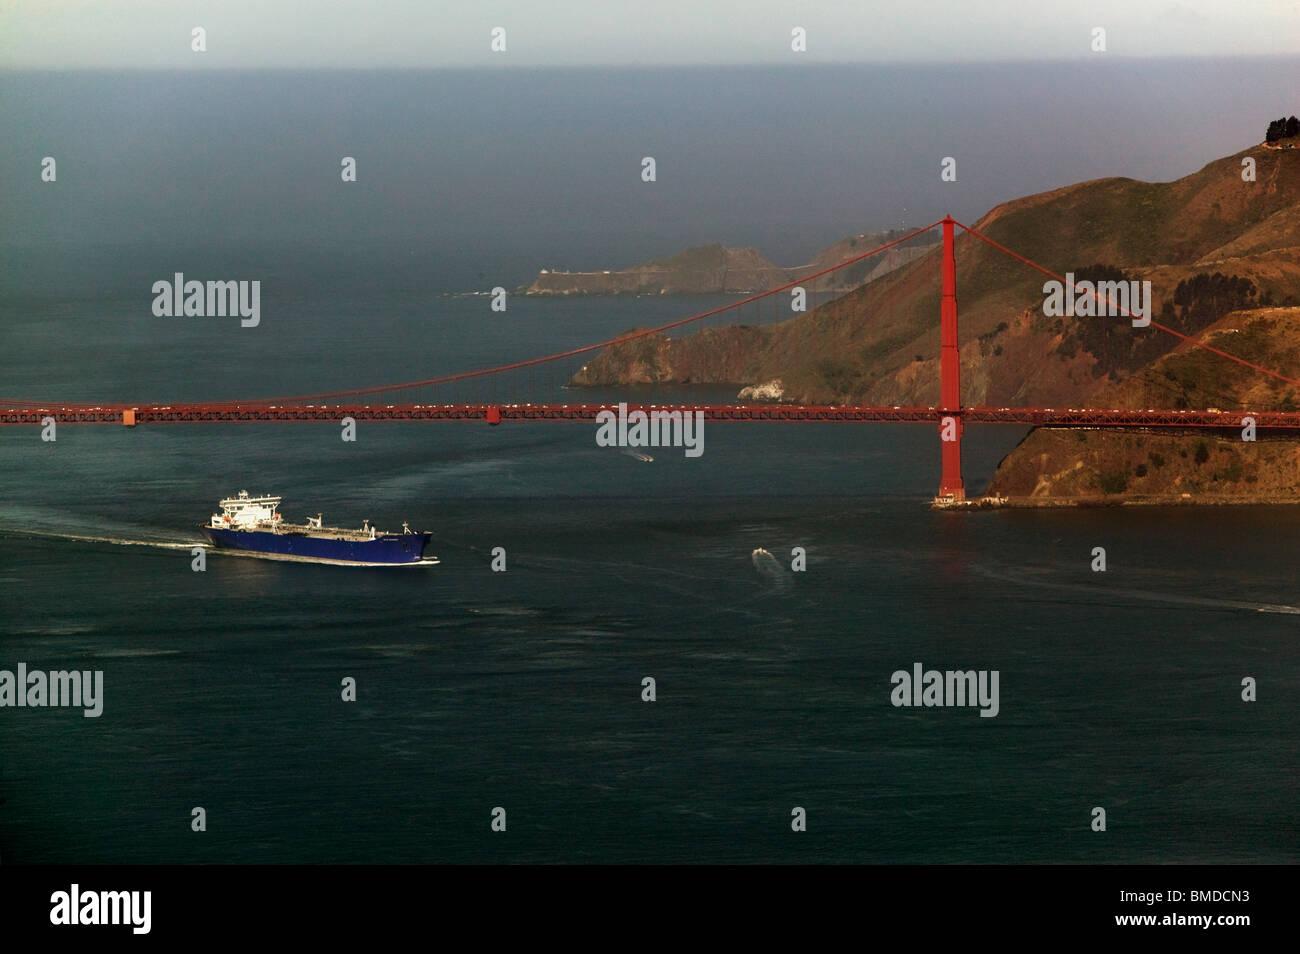 aerial view above petroleum tanker entering San Francisco Bay Golden Gate Bridge - Stock Image